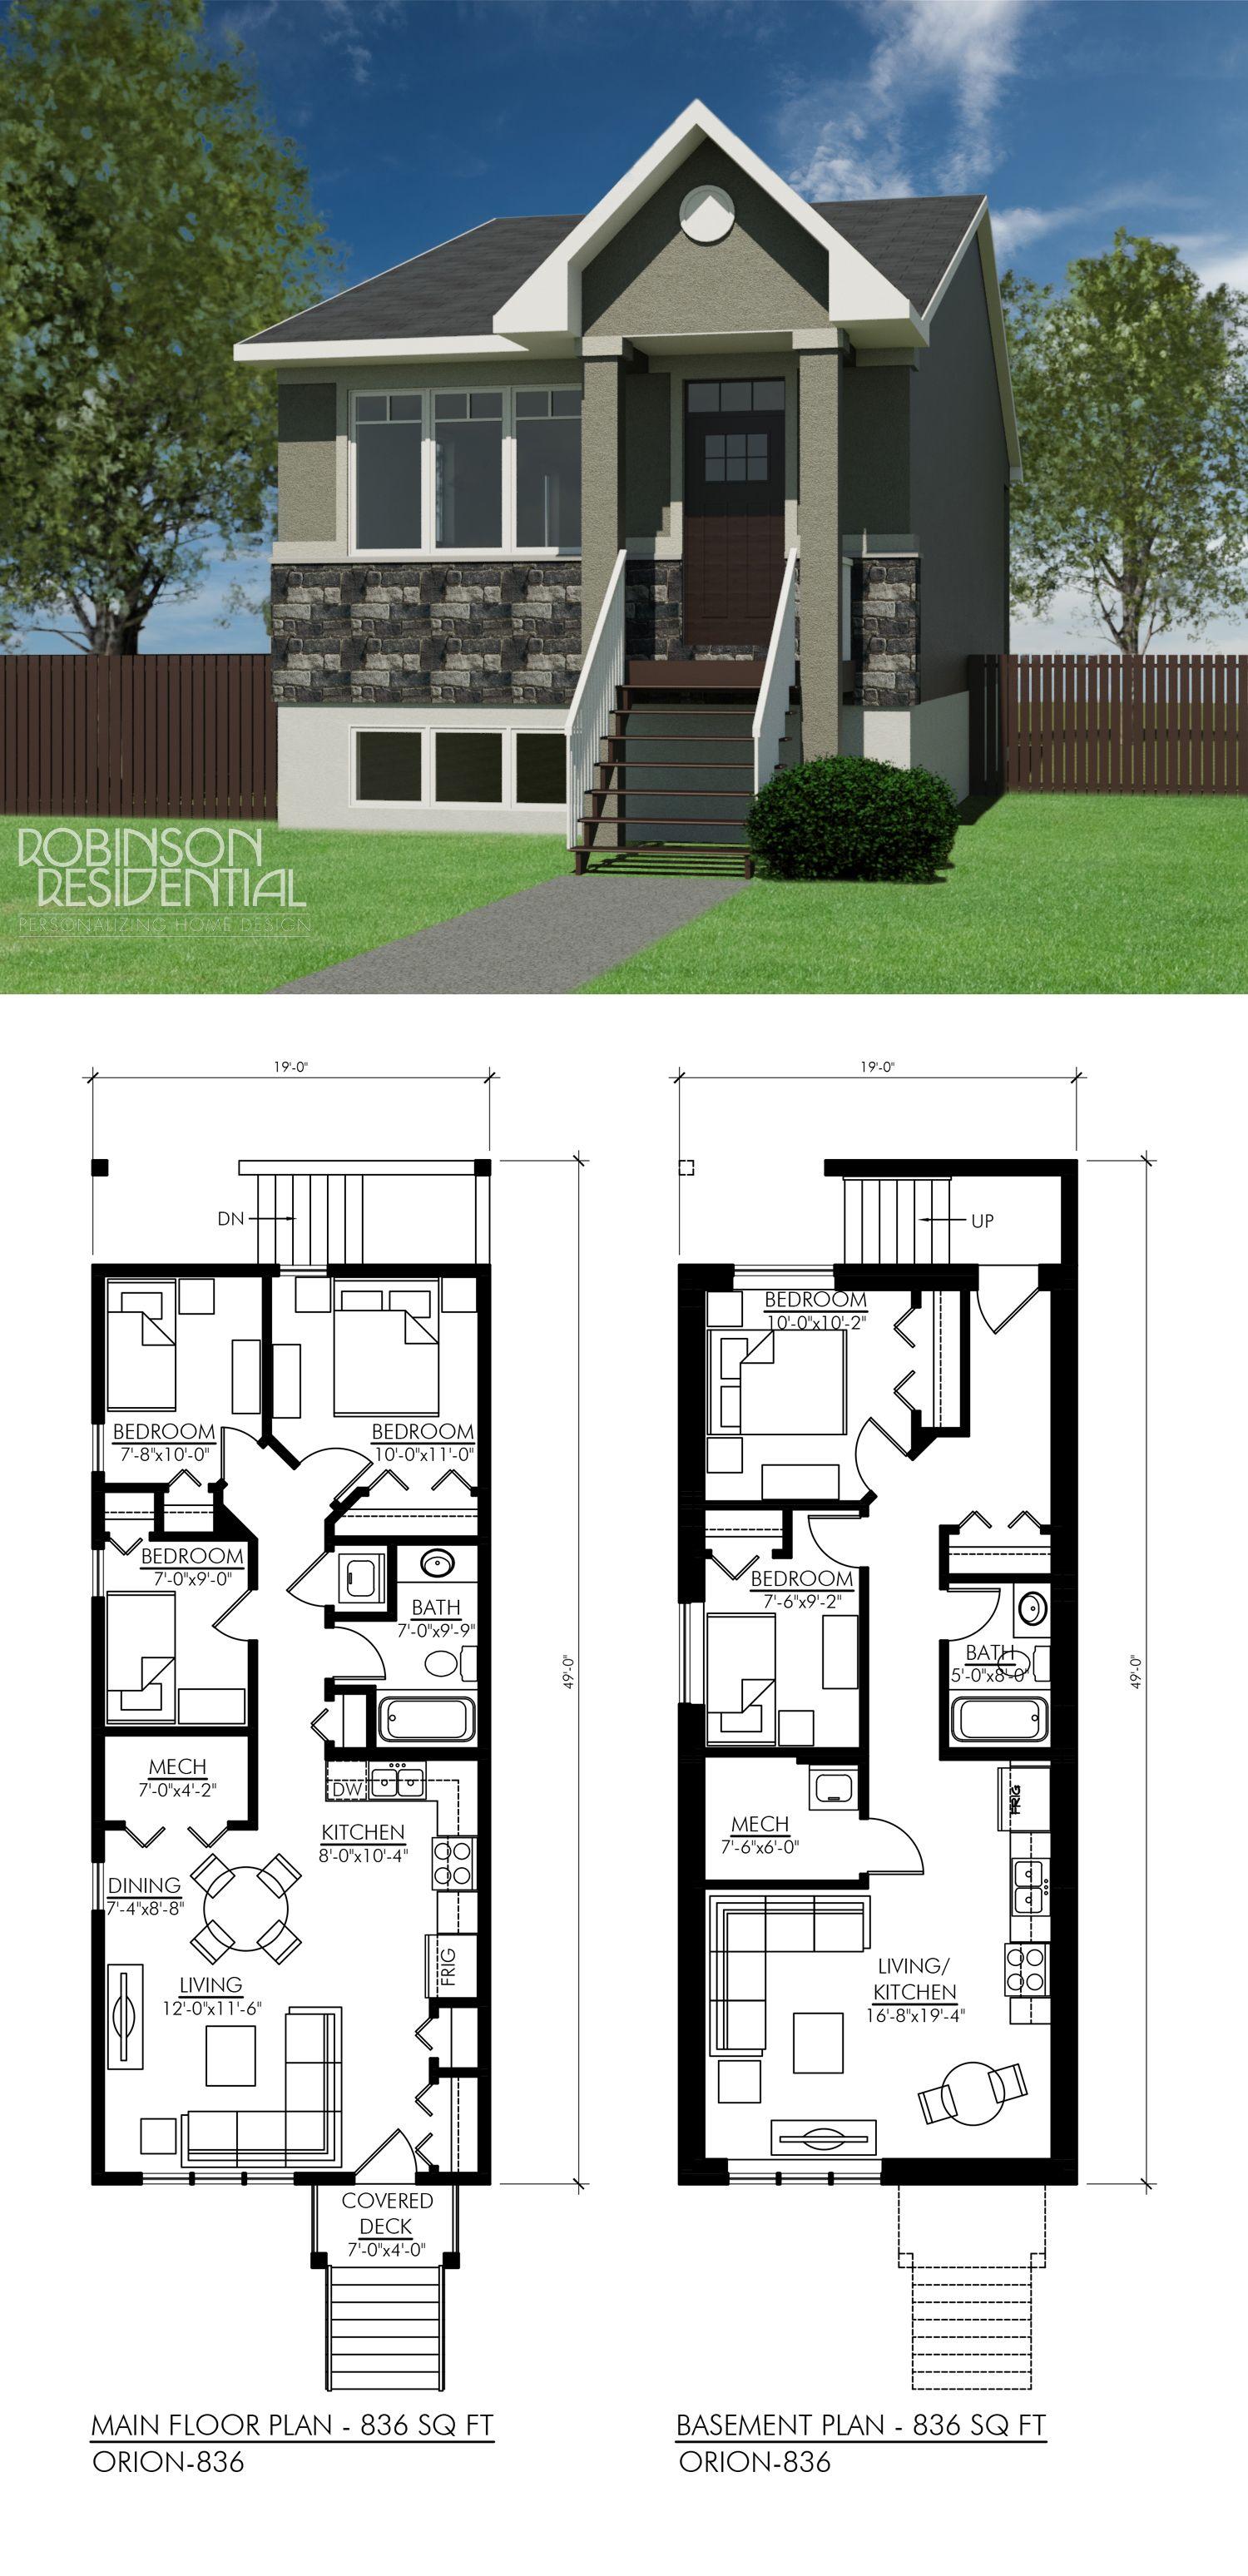 Craftsman Orion 836 Robinson Plans Bedroom House Plans 5 Bedroom House Plans House Plans